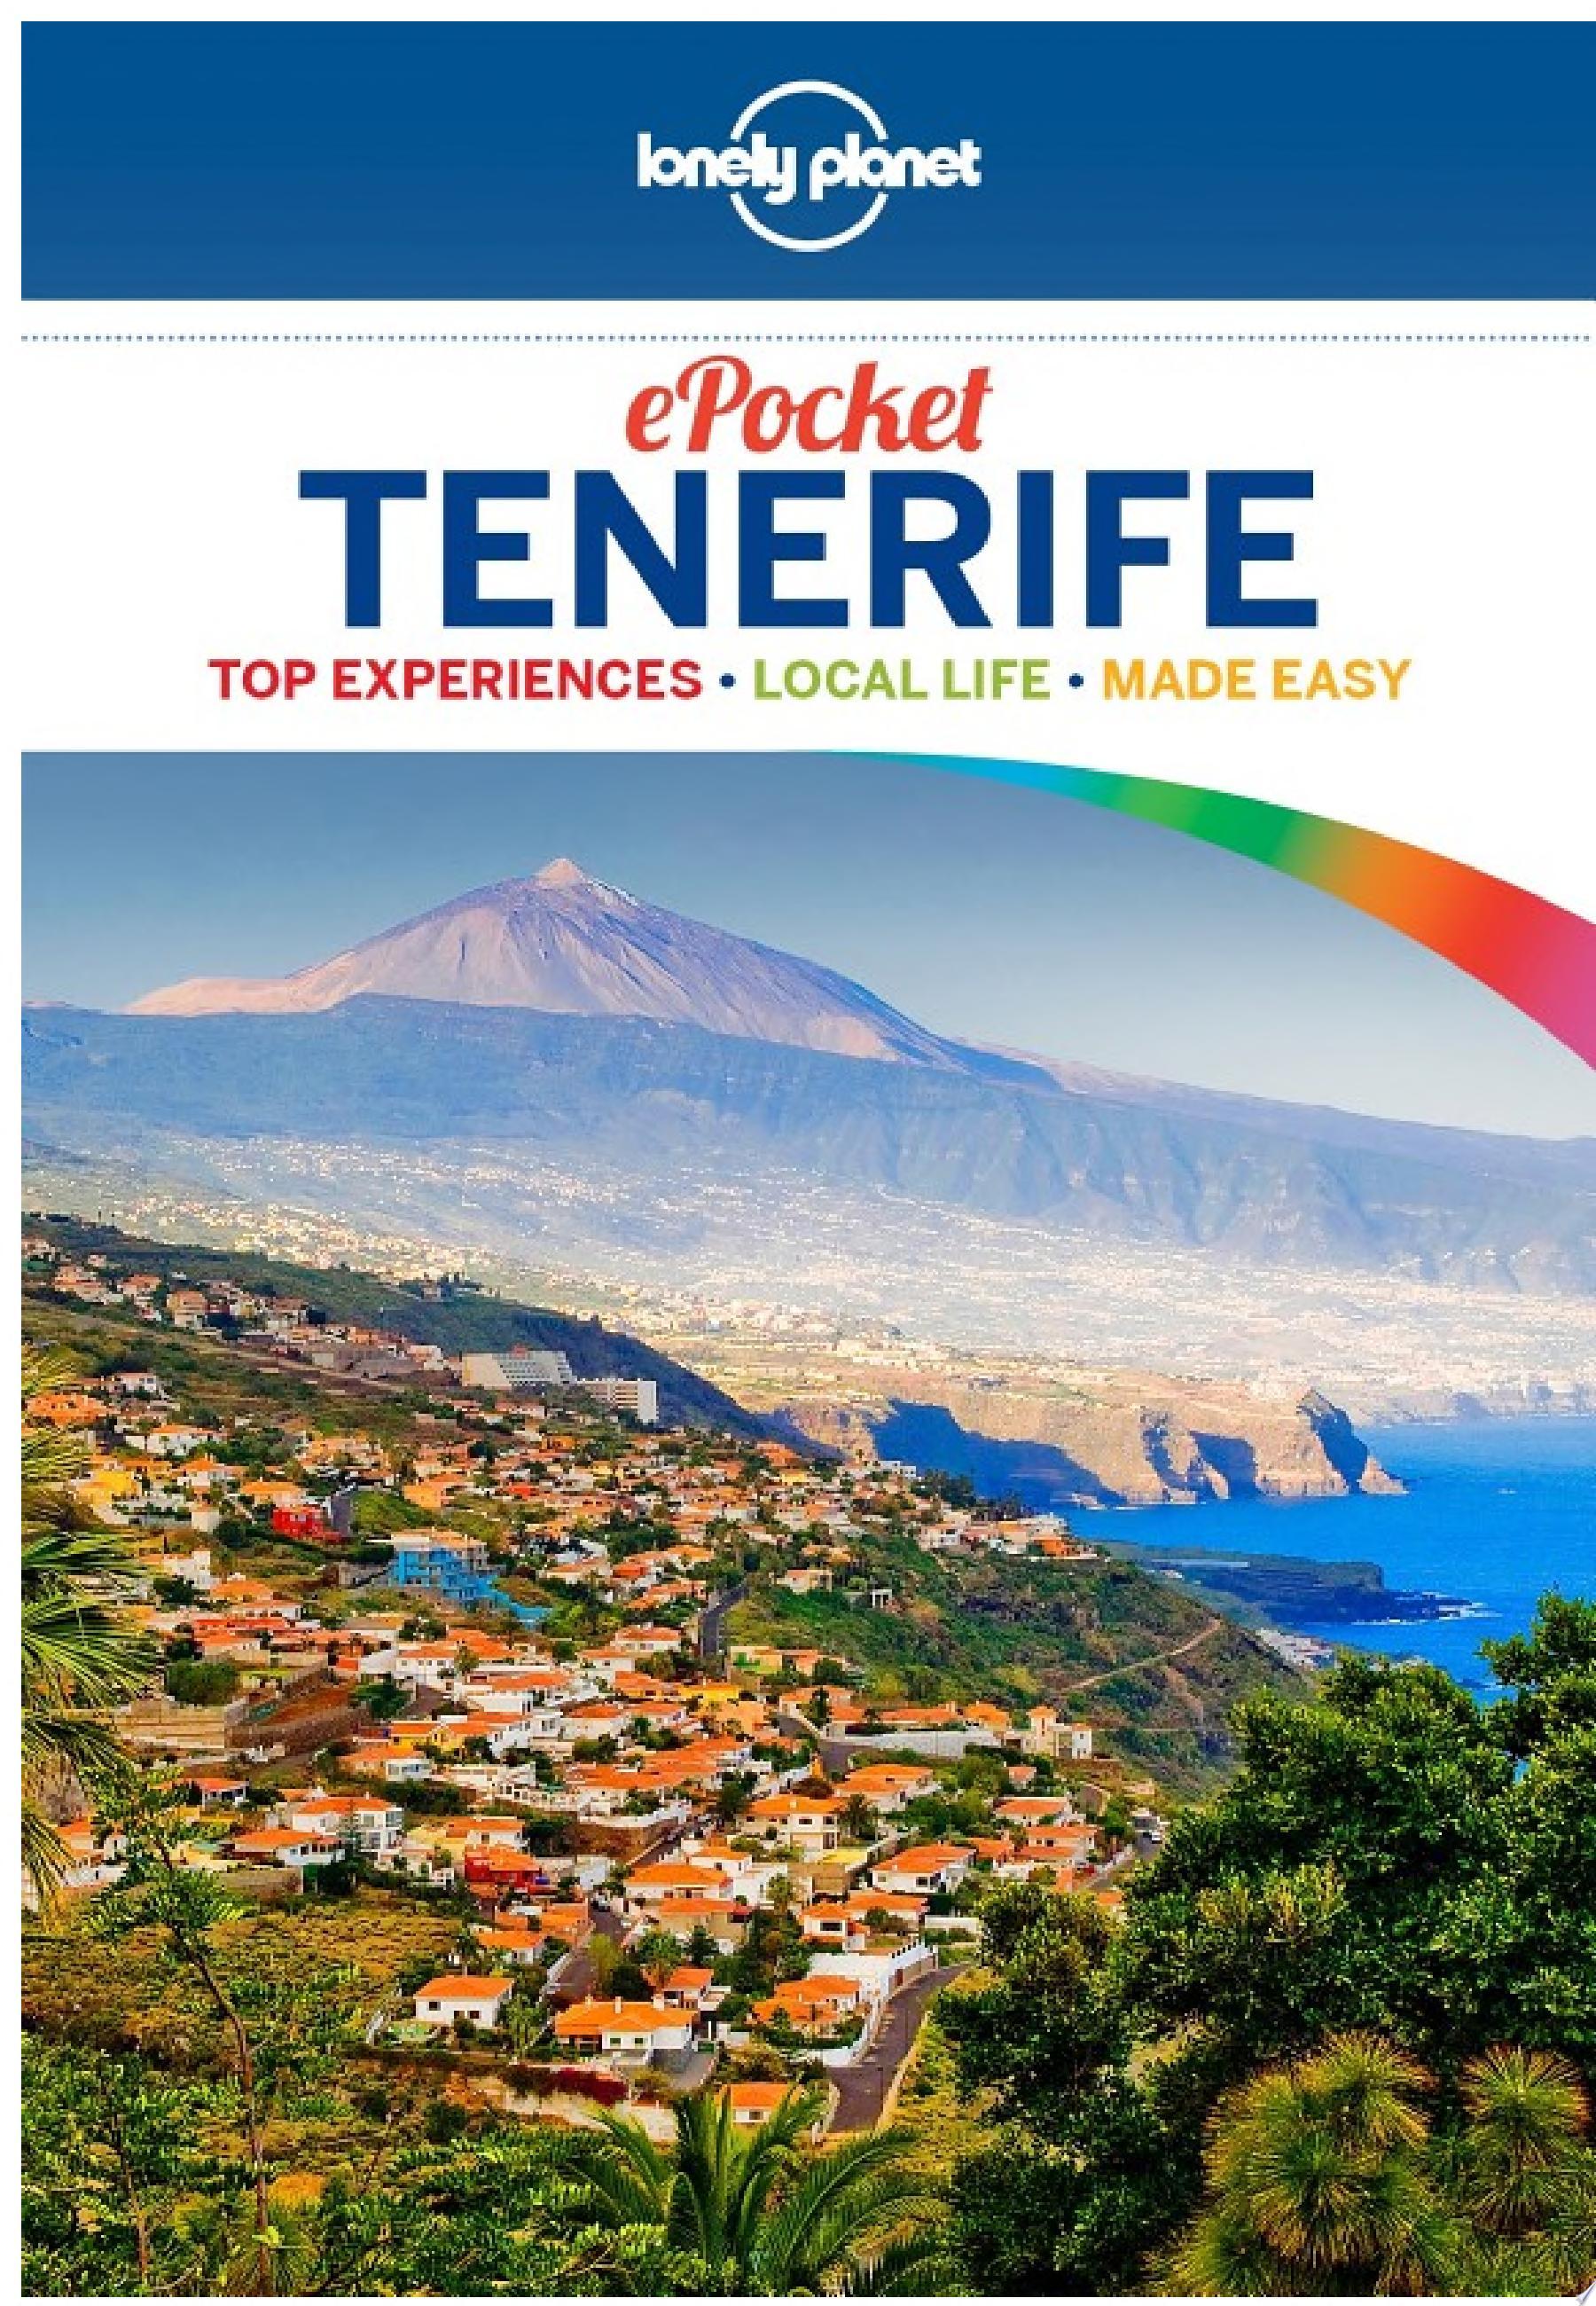 Lonely Planet Pocket Tenerife